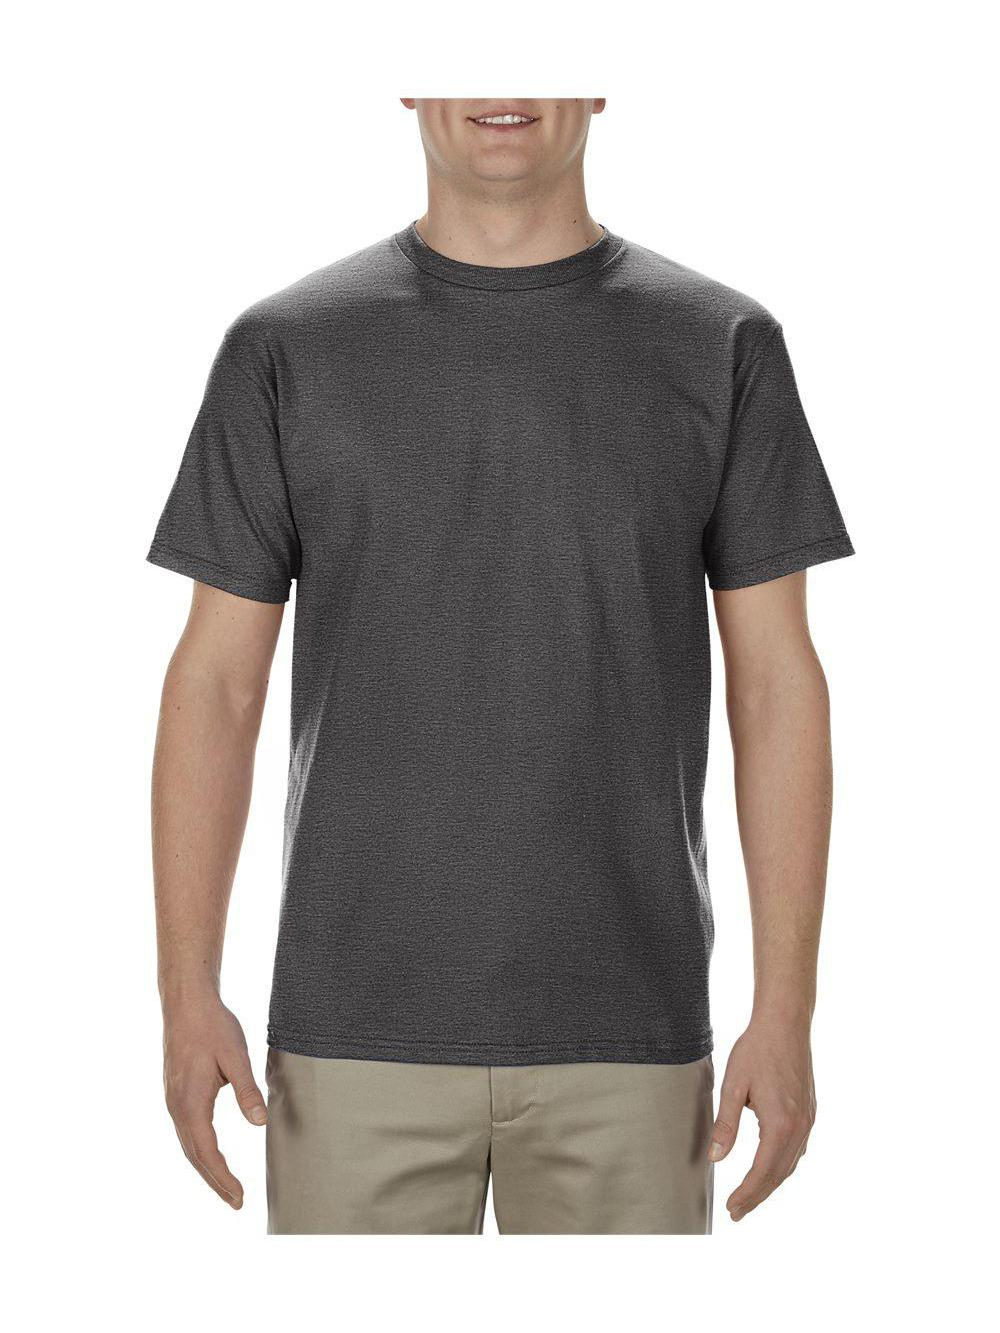 ALSTYLE-Premium-T-Shirt-1701 thumbnail 27